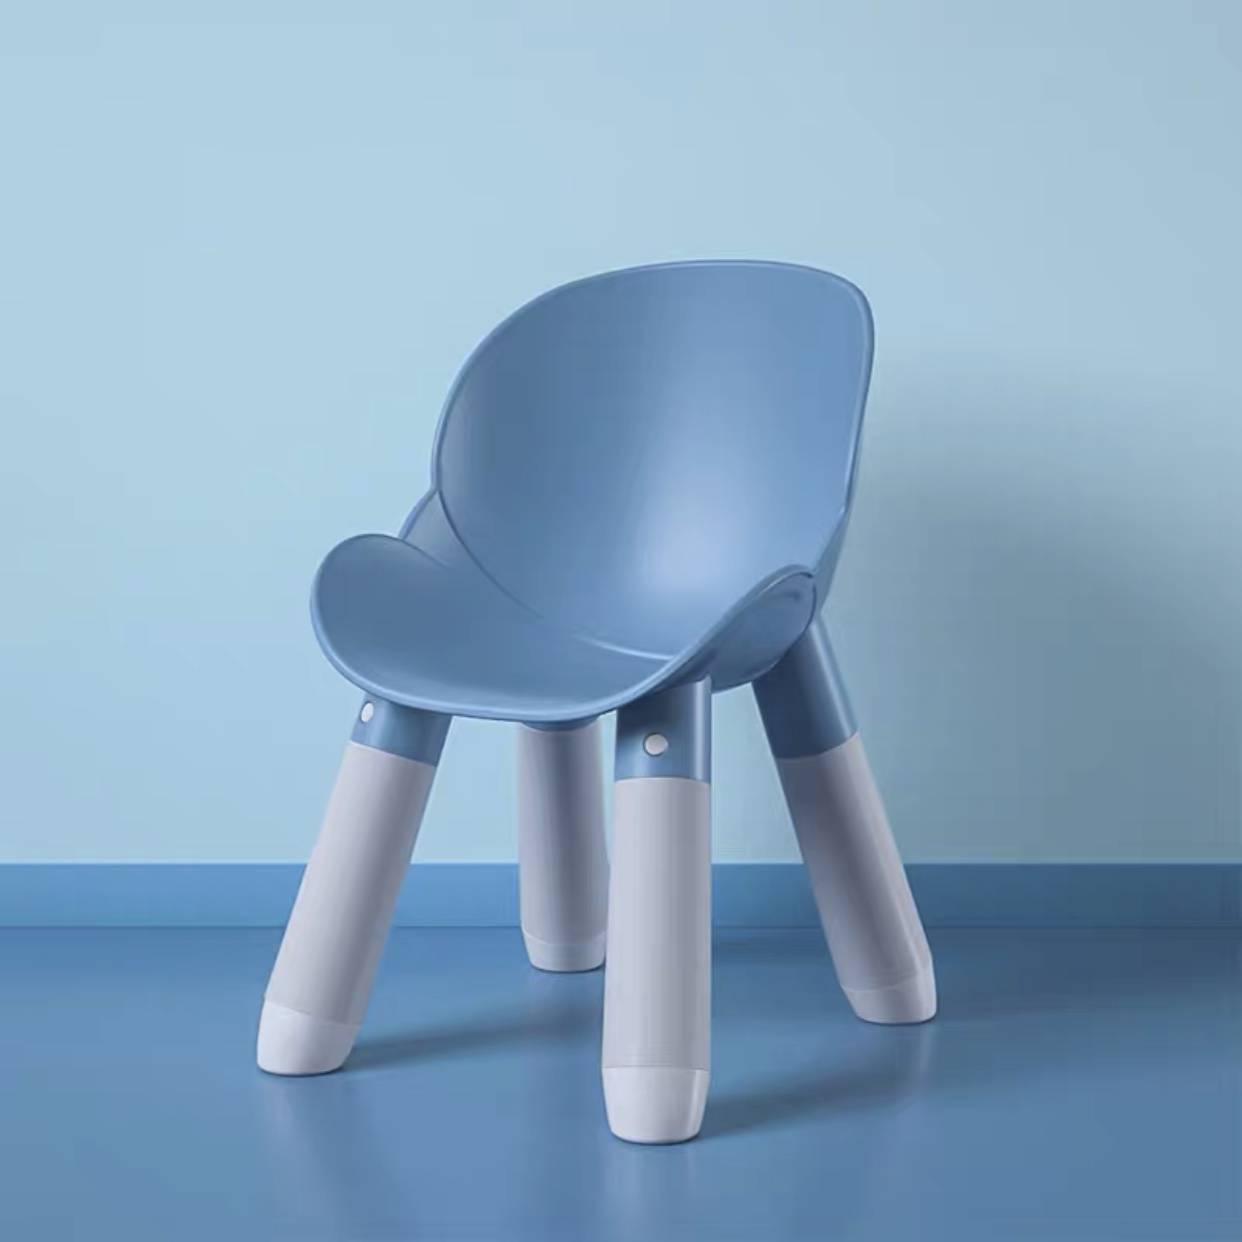 Child Chair Furniture Silla De Comer Para Bebe Back Kindergarten кухонный Seat Bench Student Plastic Chairs Home детский стул